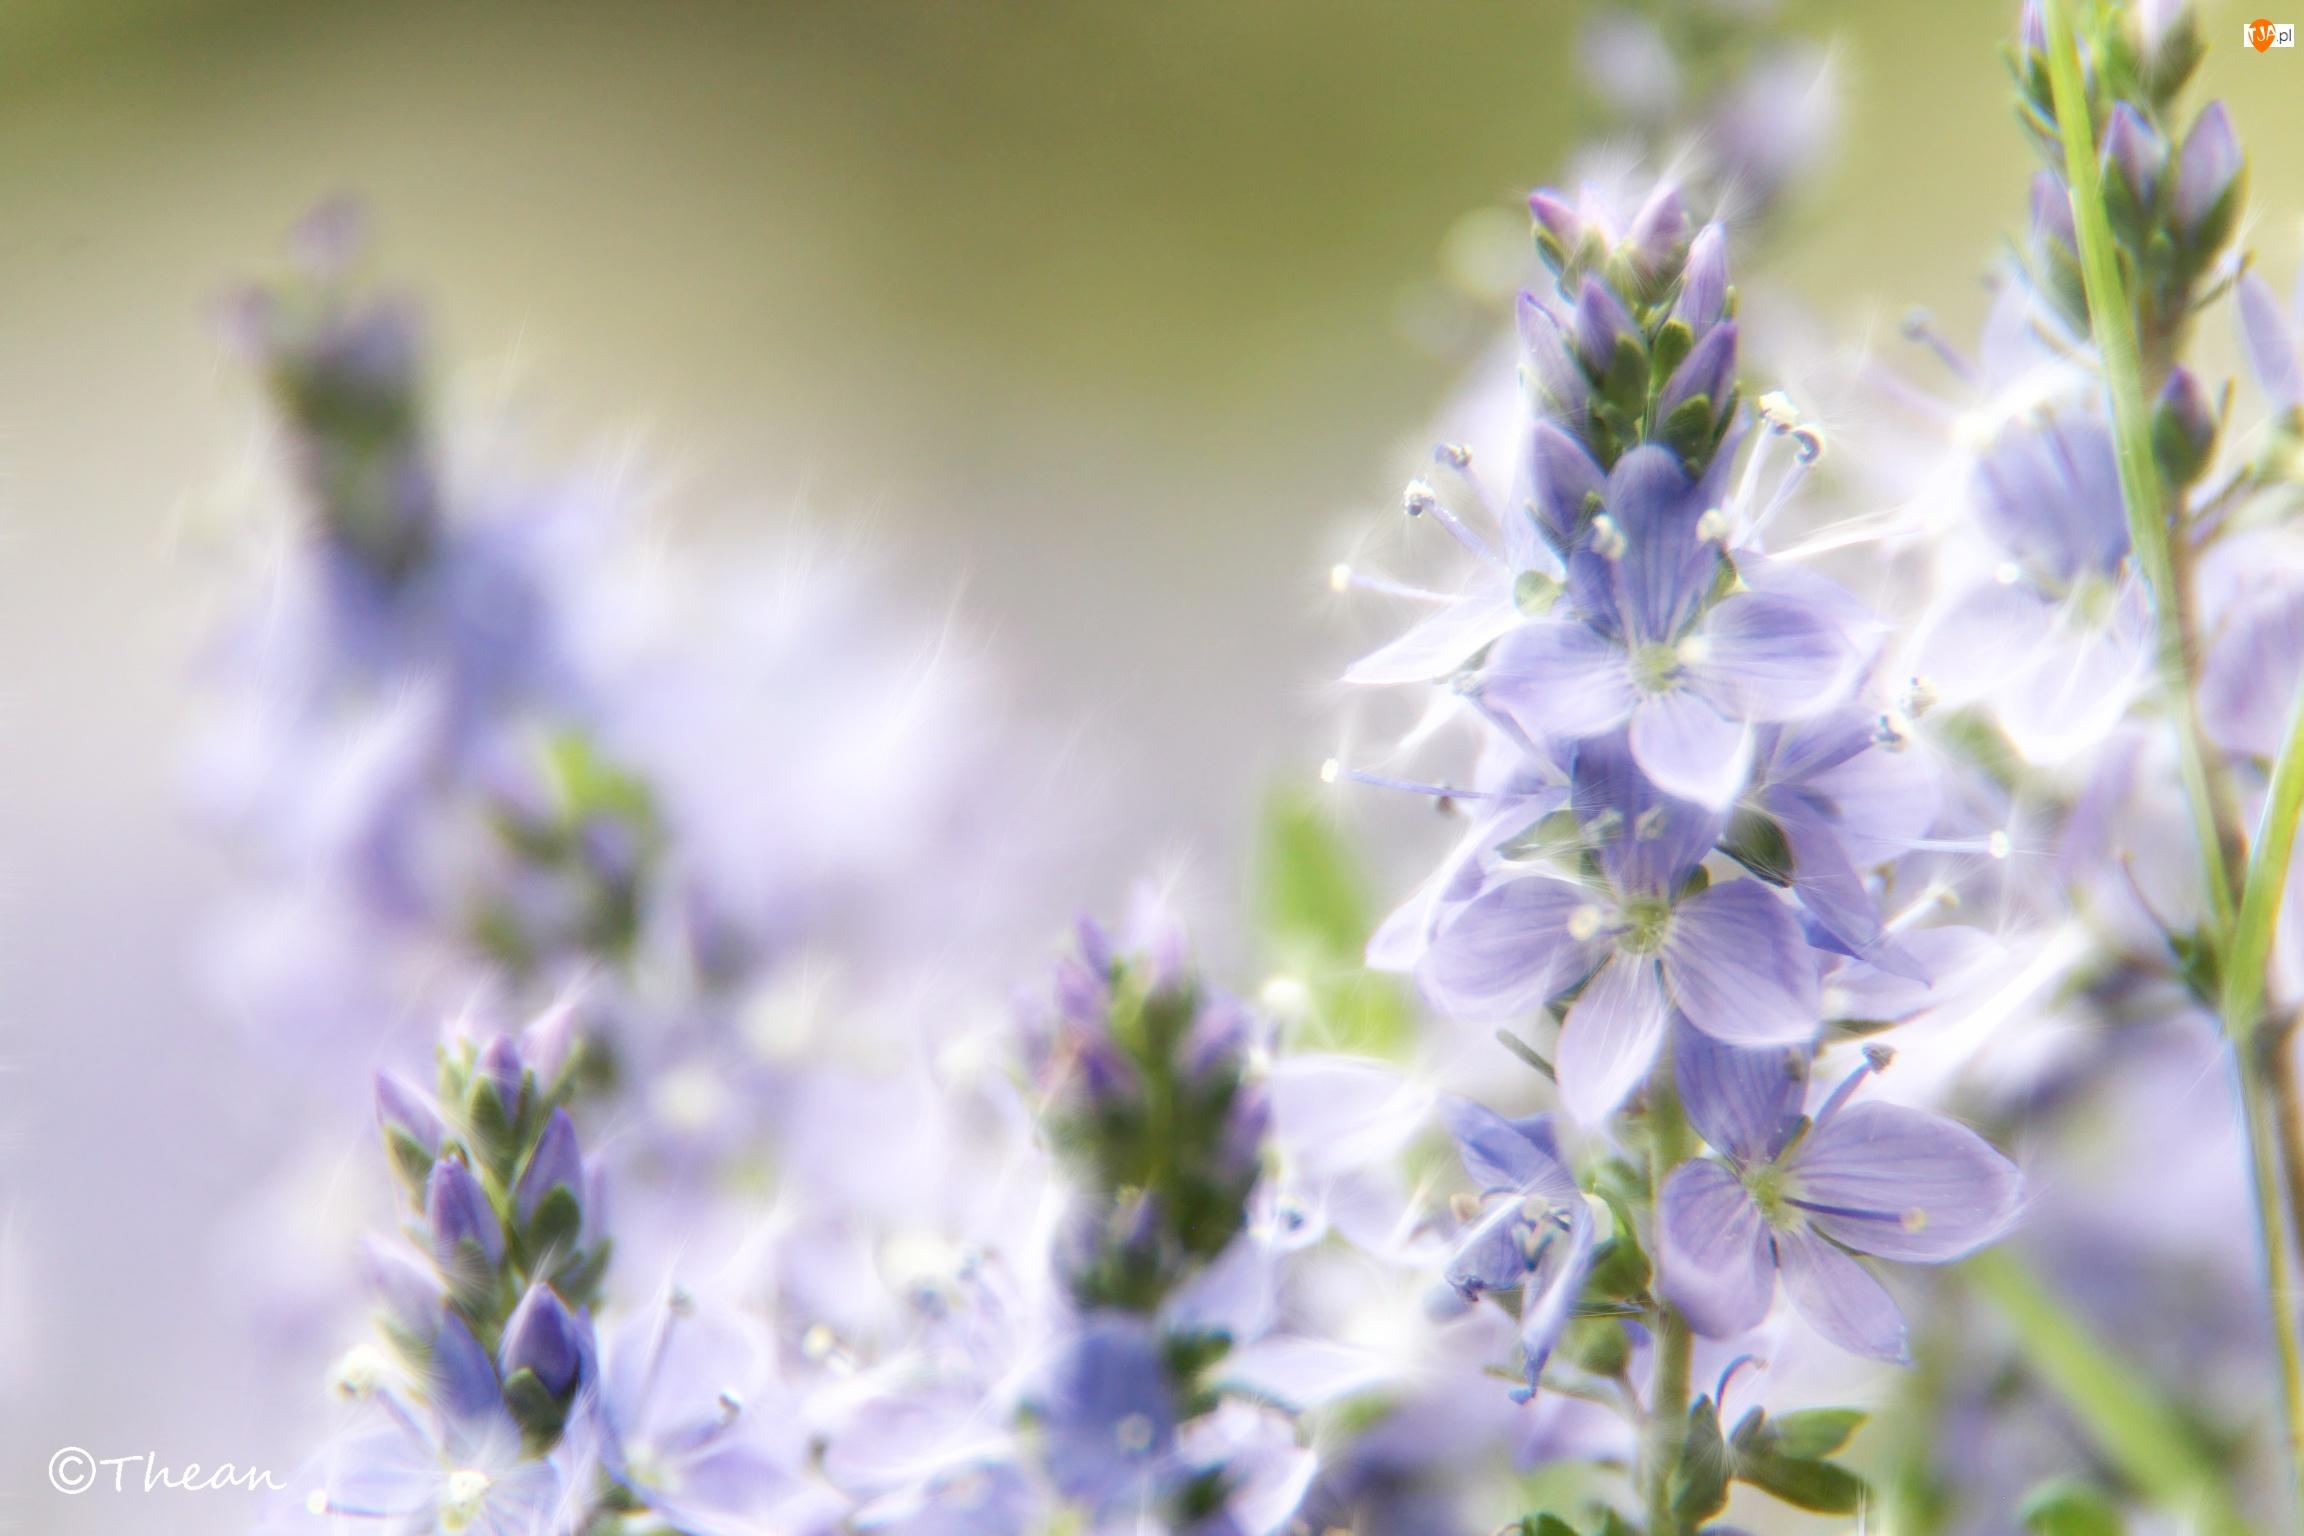 Fractalius, Fioletowe, Kwiaty